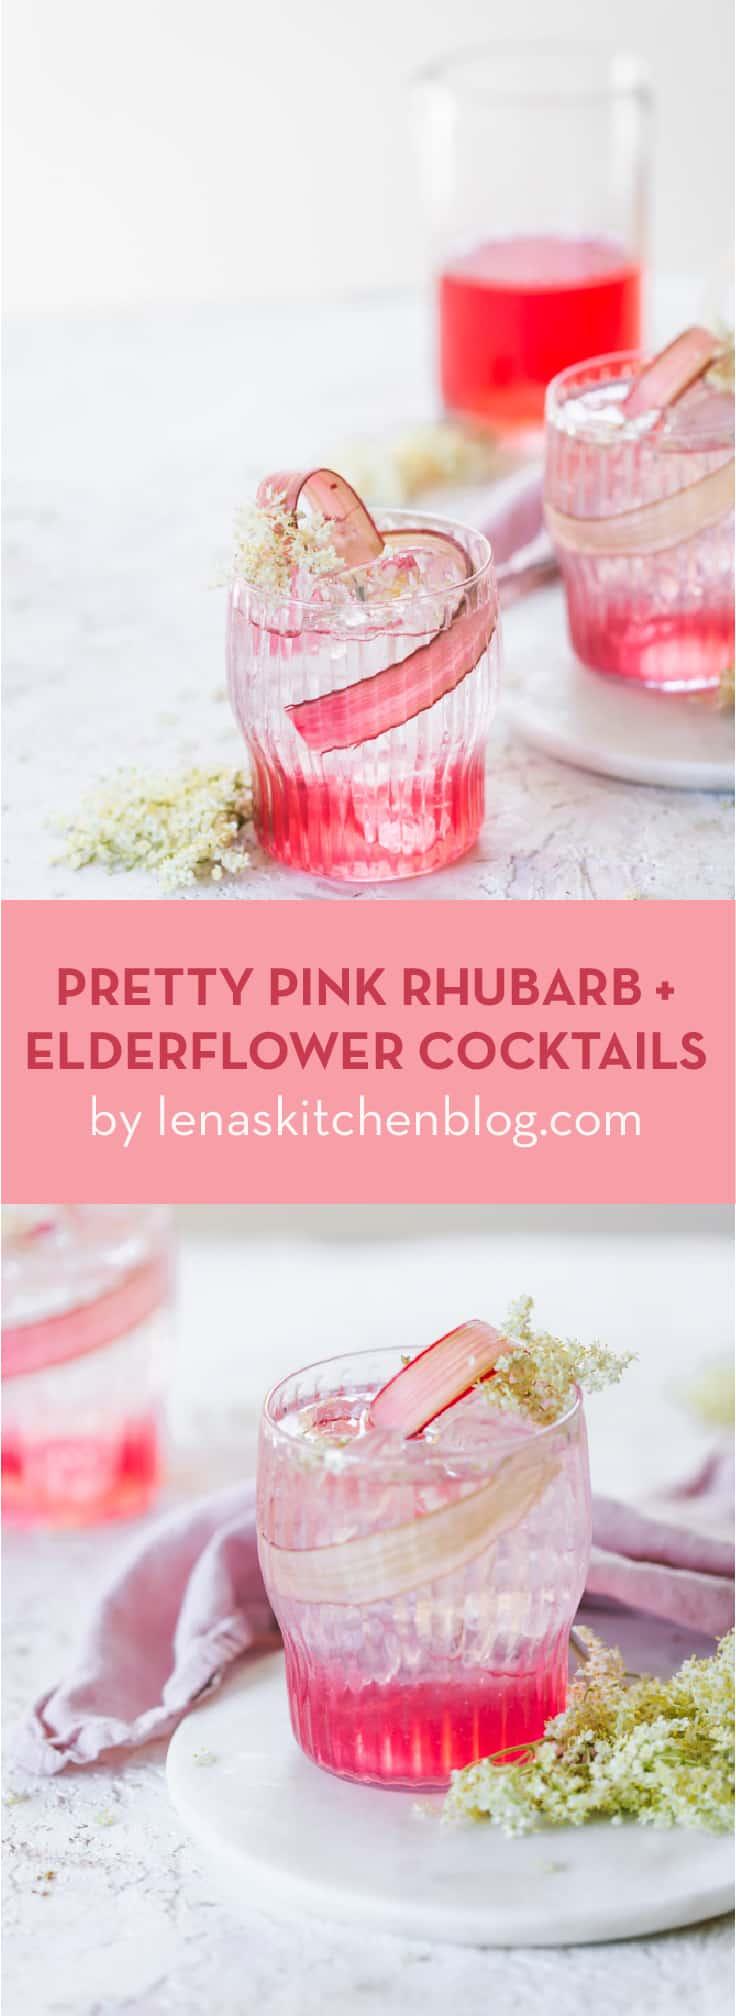 SUMMER COCKTAIL, PINK RHUBARB + ELDERFLOWER COCKTAILS